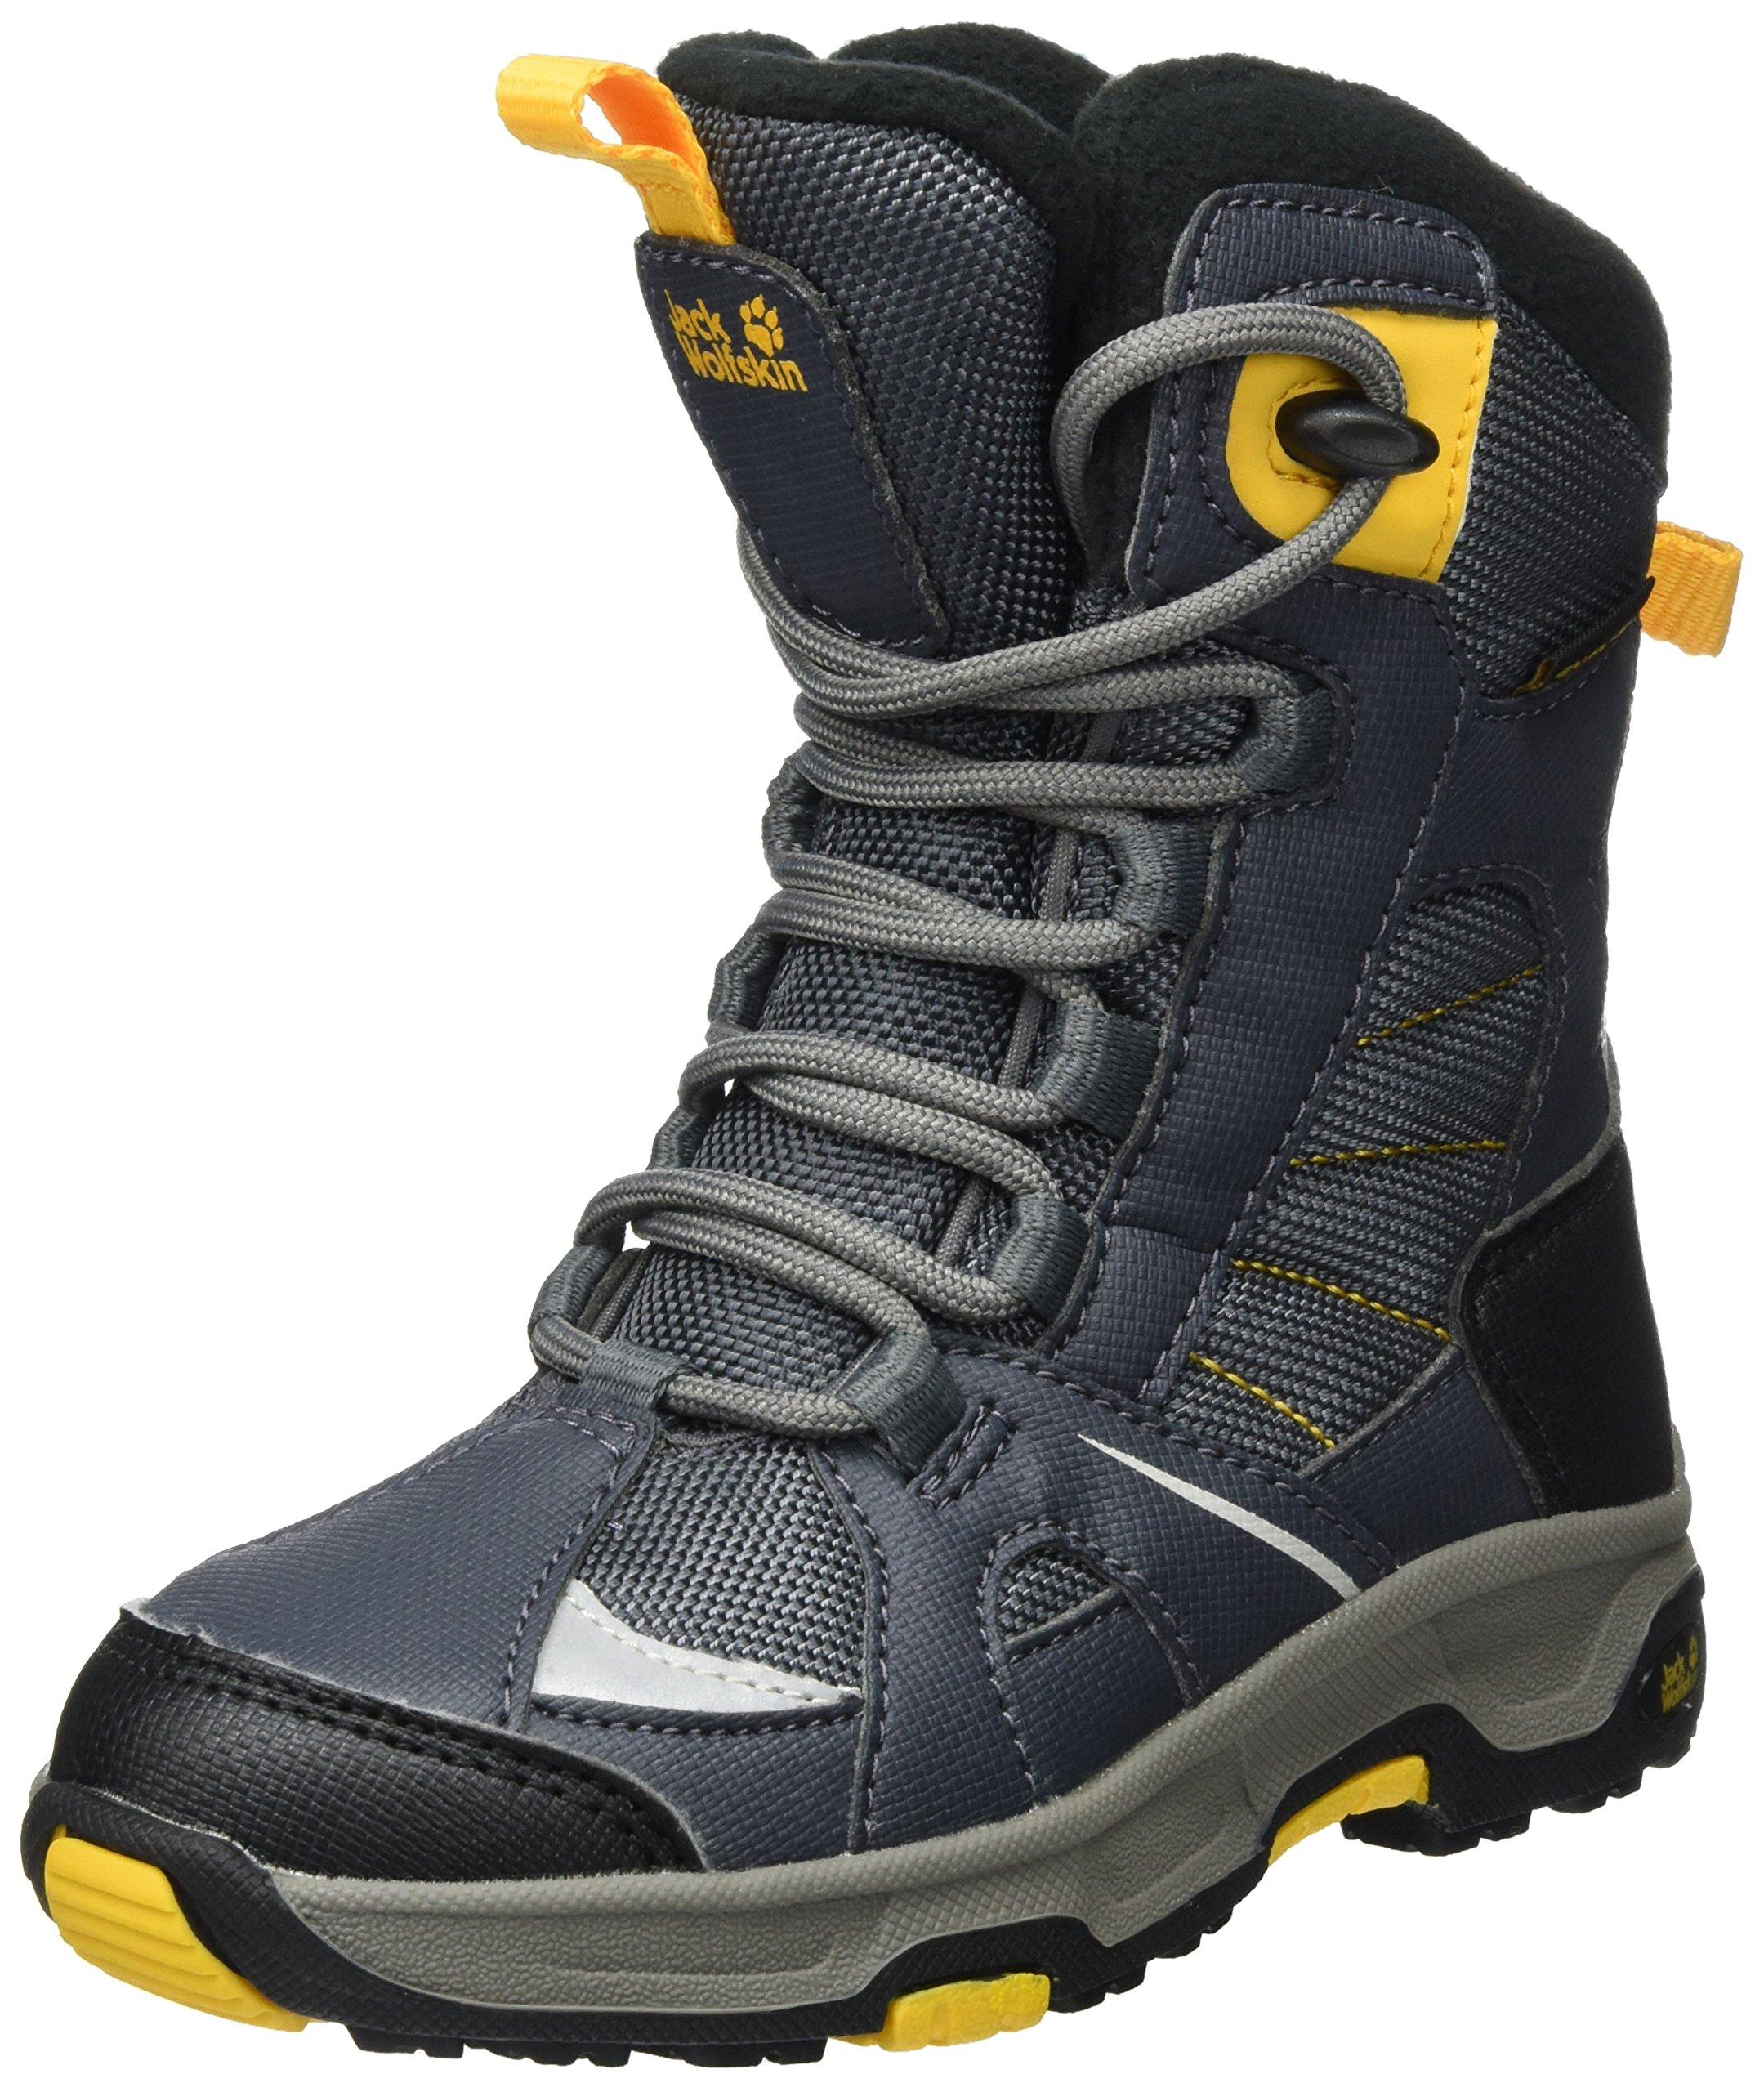 Jack Wolfskin Boys Snow Ride Texapore Boot, Burly Yellow xt 6 M US Big Kid